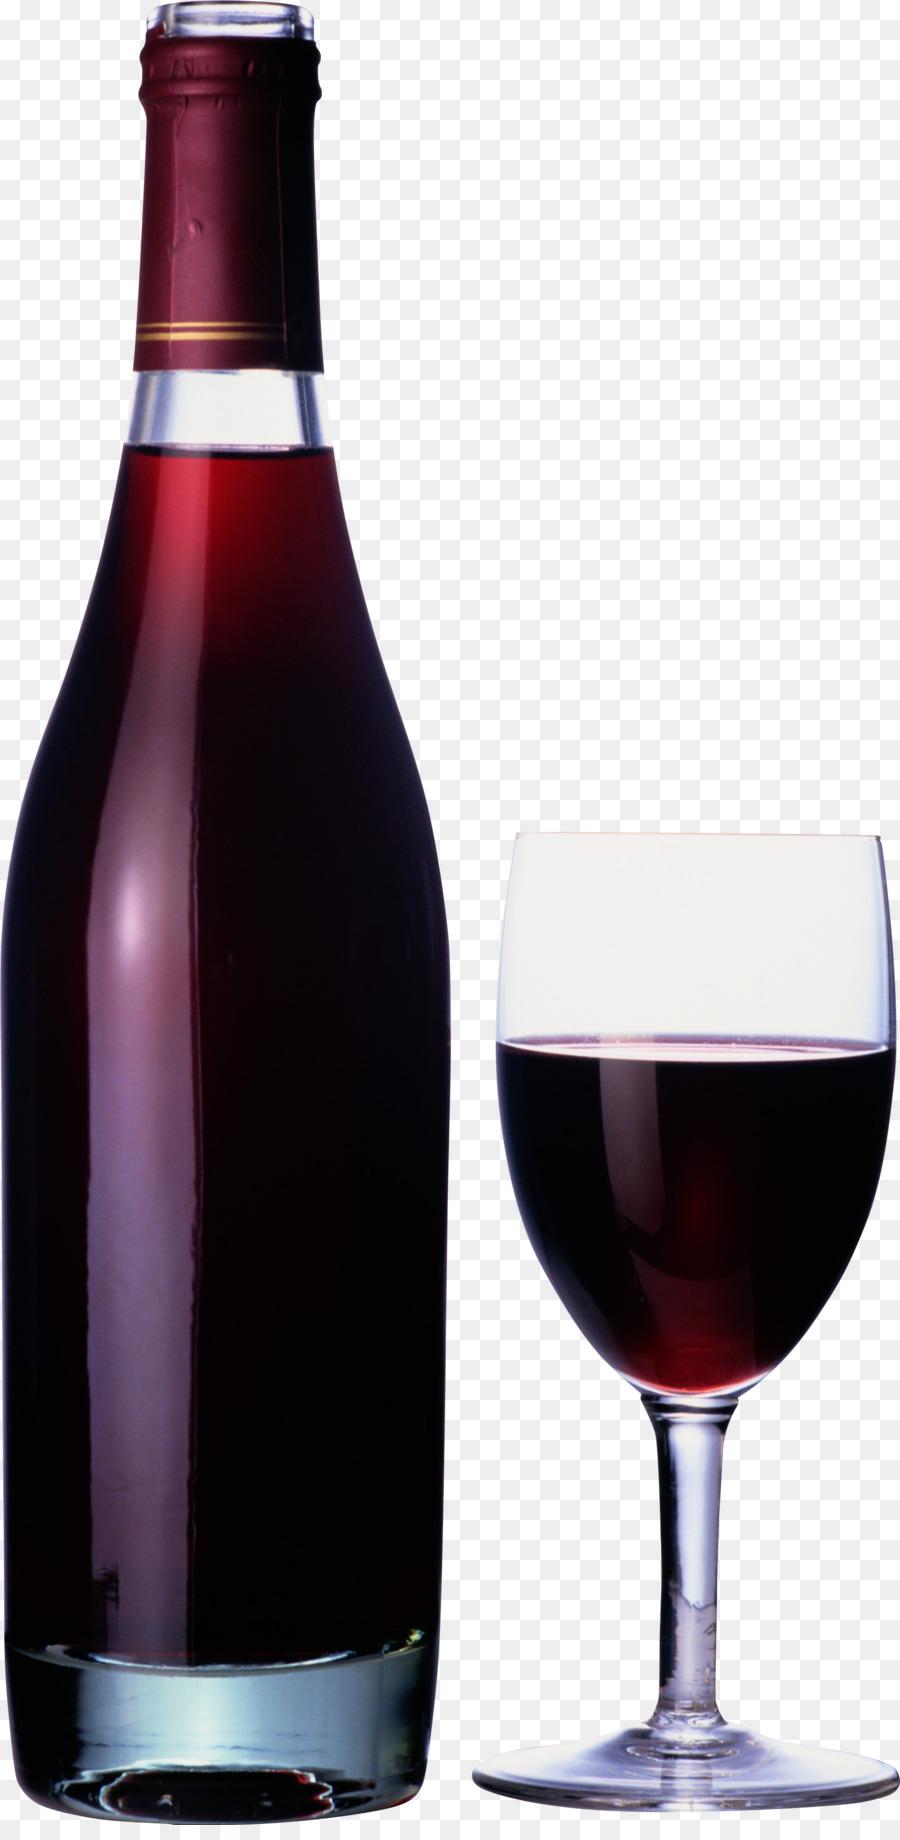 Descarga gratuita de Vino, Vino Tinto, Rosa Imágen de Png